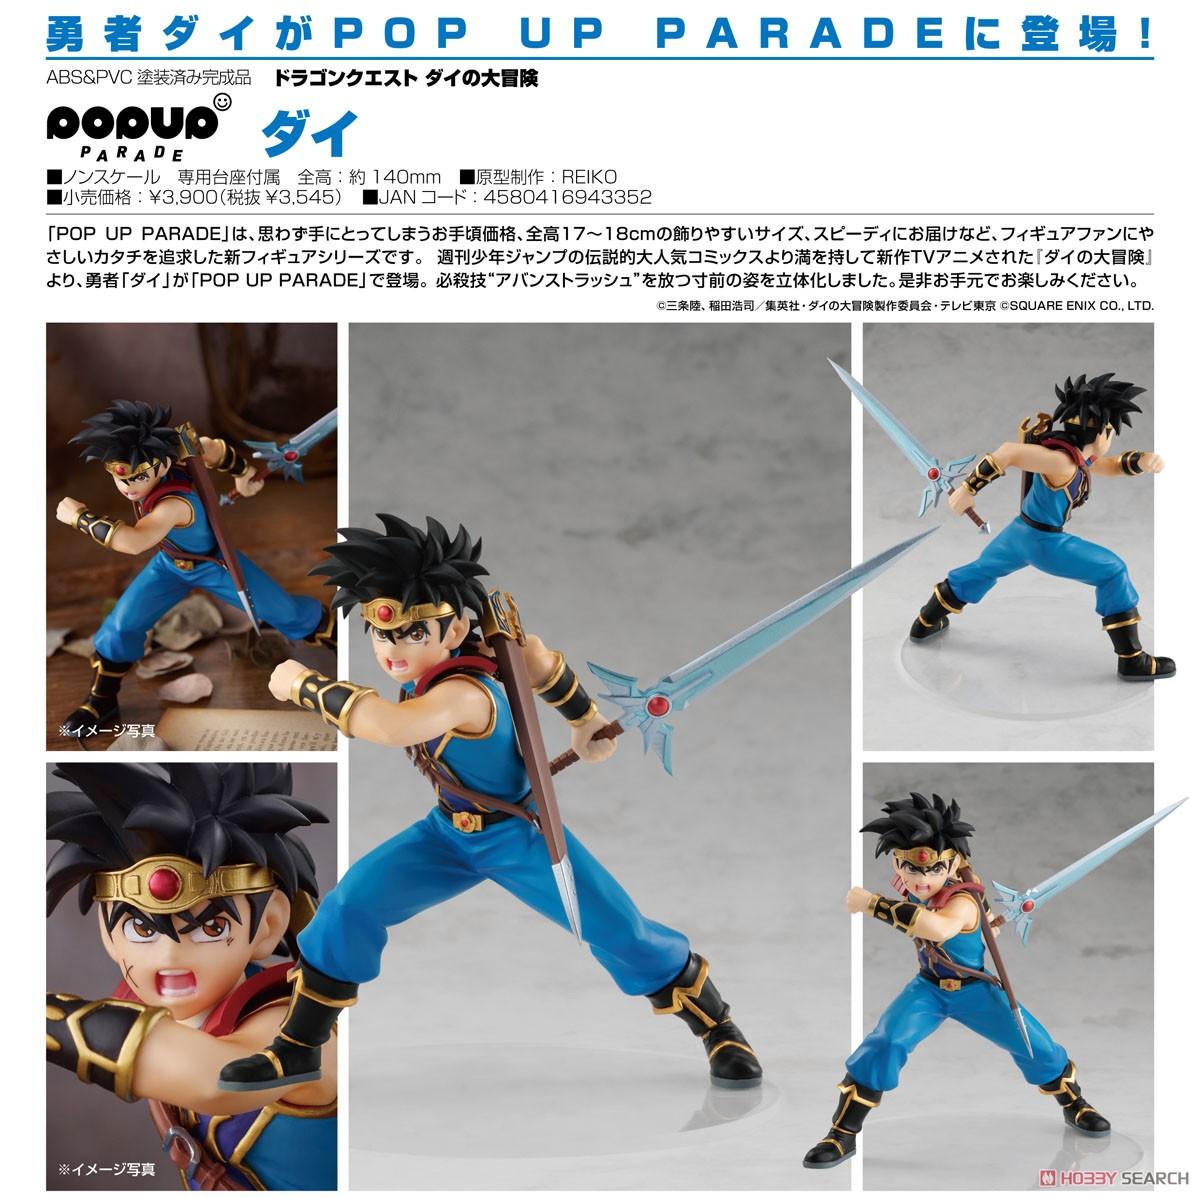 POP UP PARADE『ダイ』ドラゴンクエスト ダイの大冒険 完成品フィギュア-009